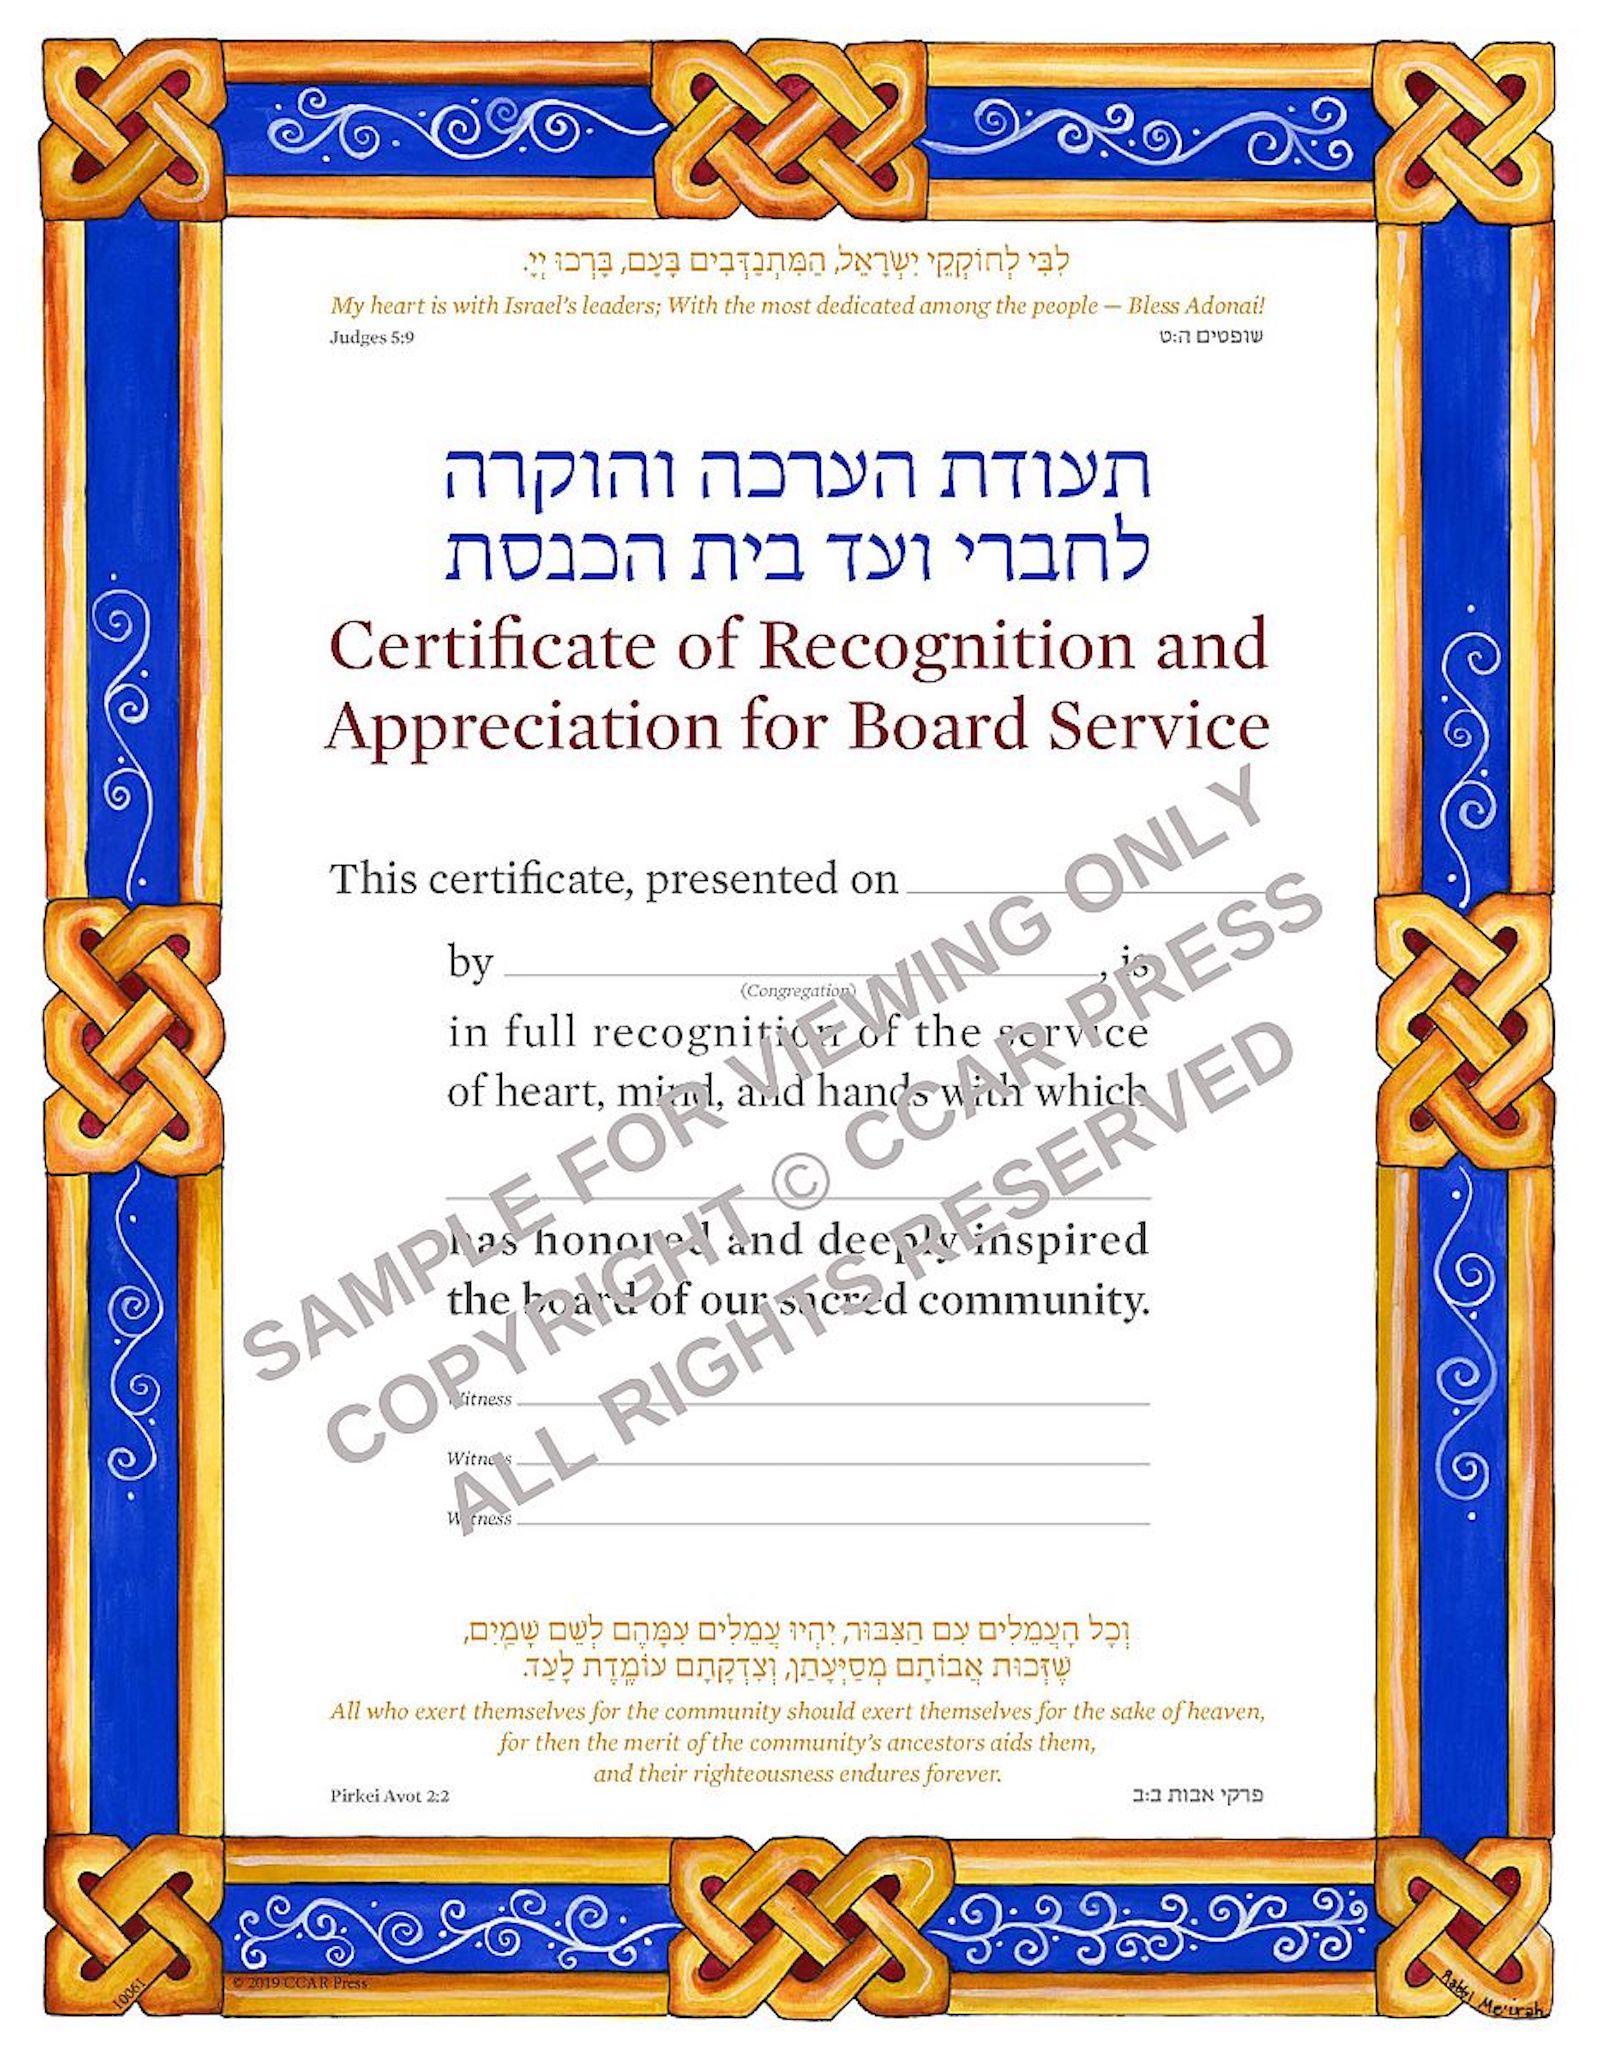 Recognizing Board Members - Certificate